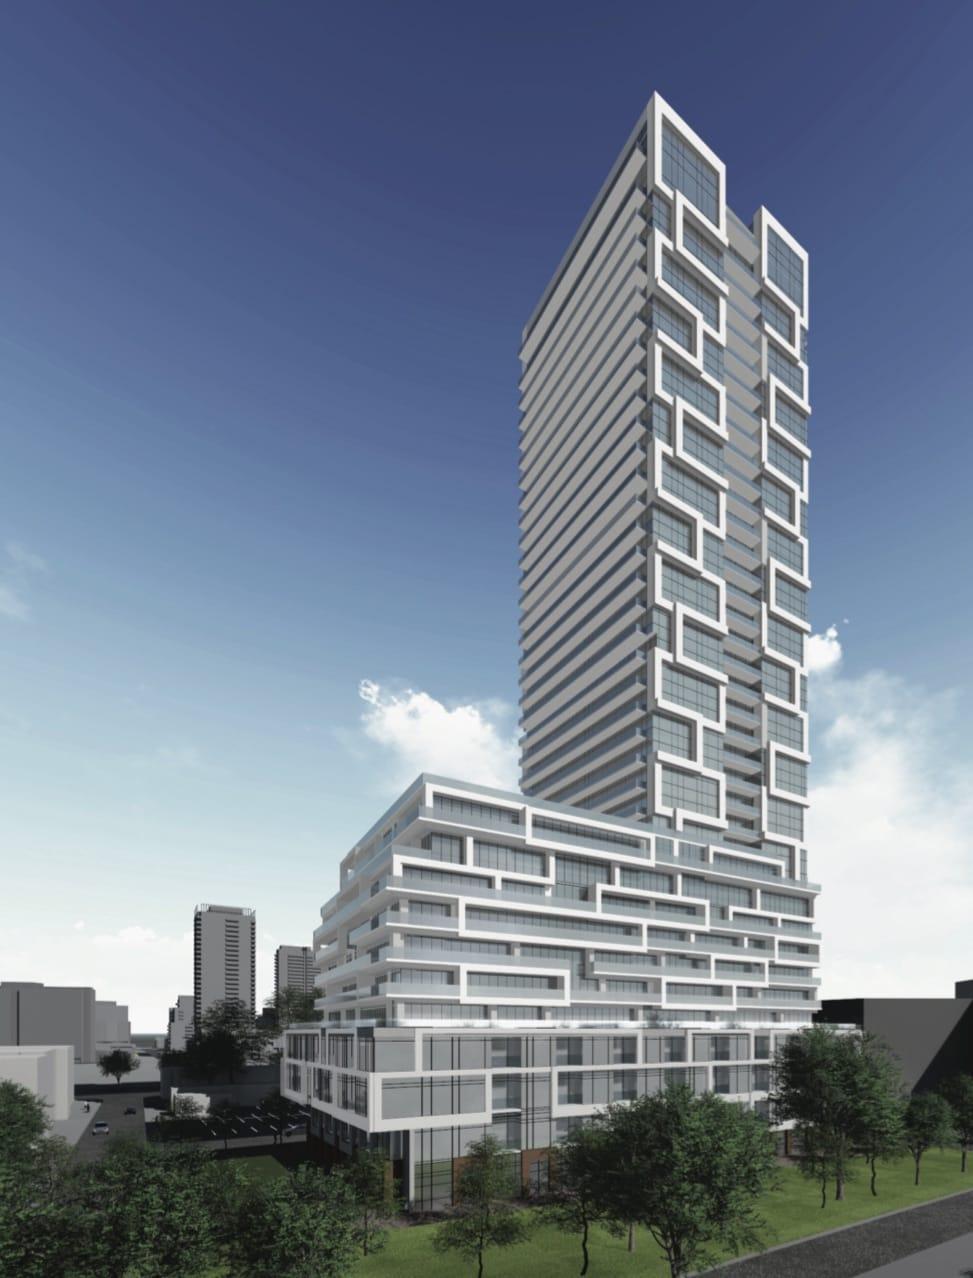 River & Fifth Condos Building Exterior